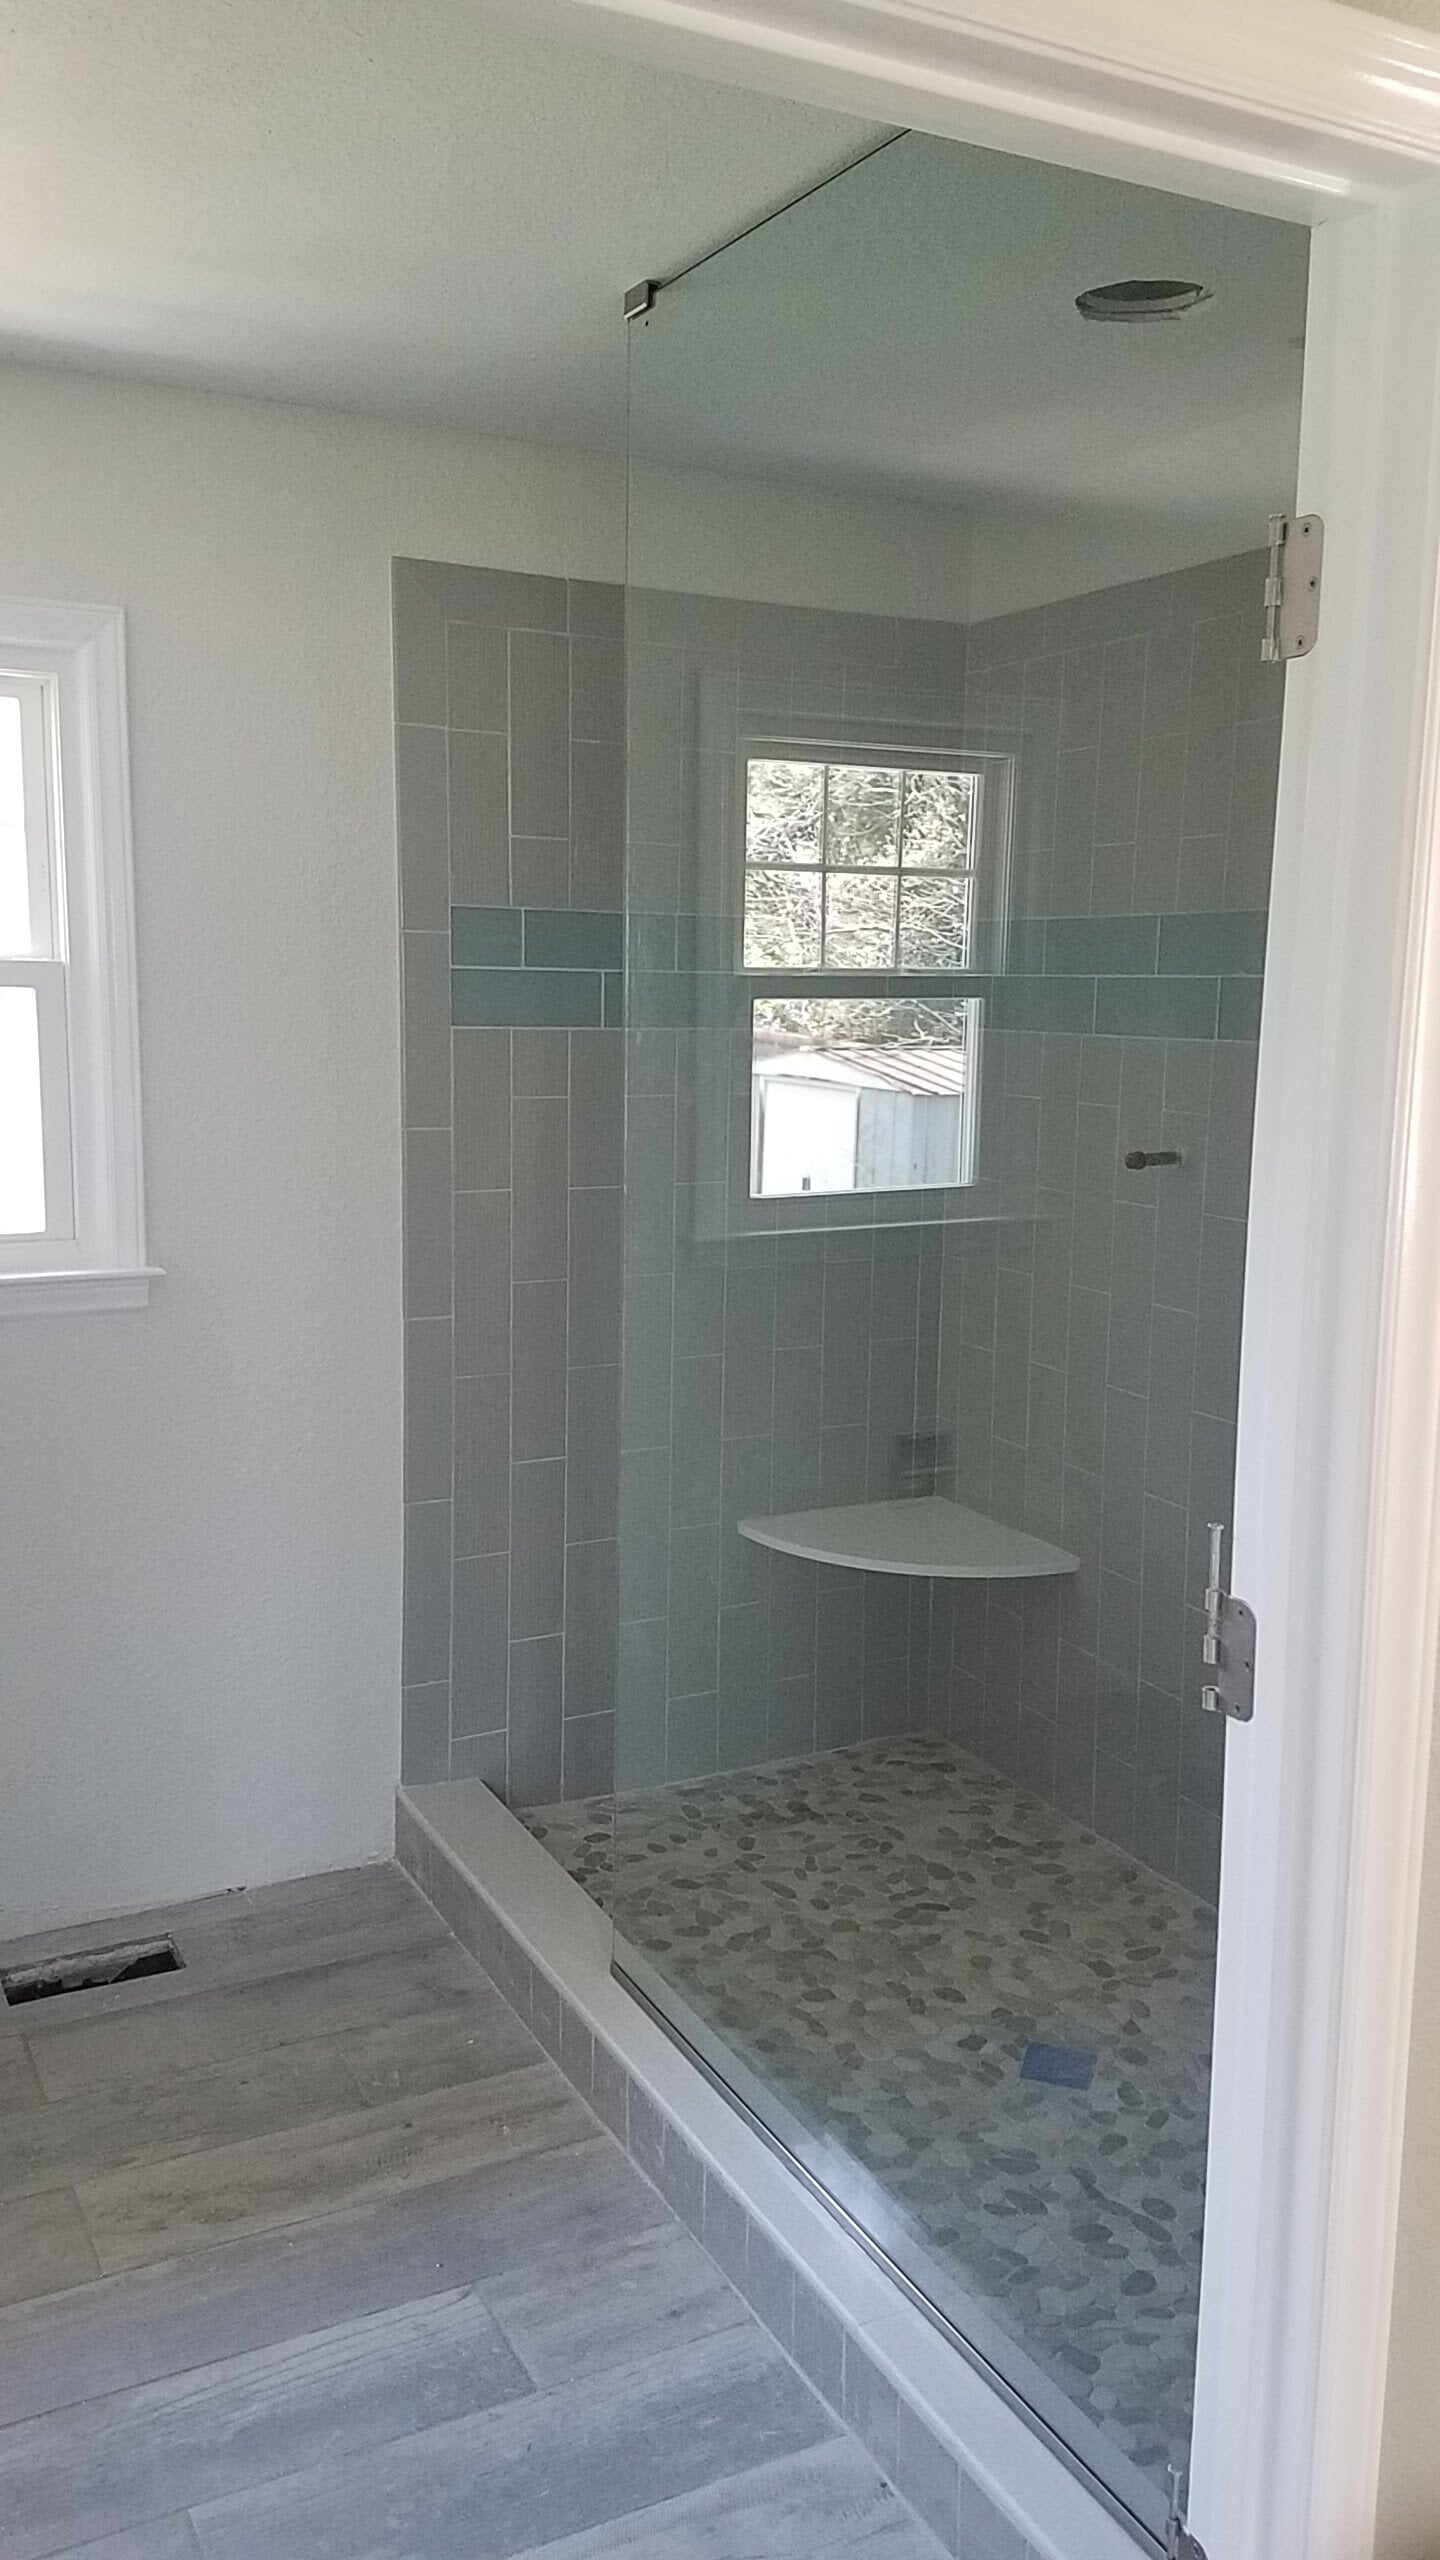 Modern bathroom remodel in Mooresville, NC from McLean Floorcoverings